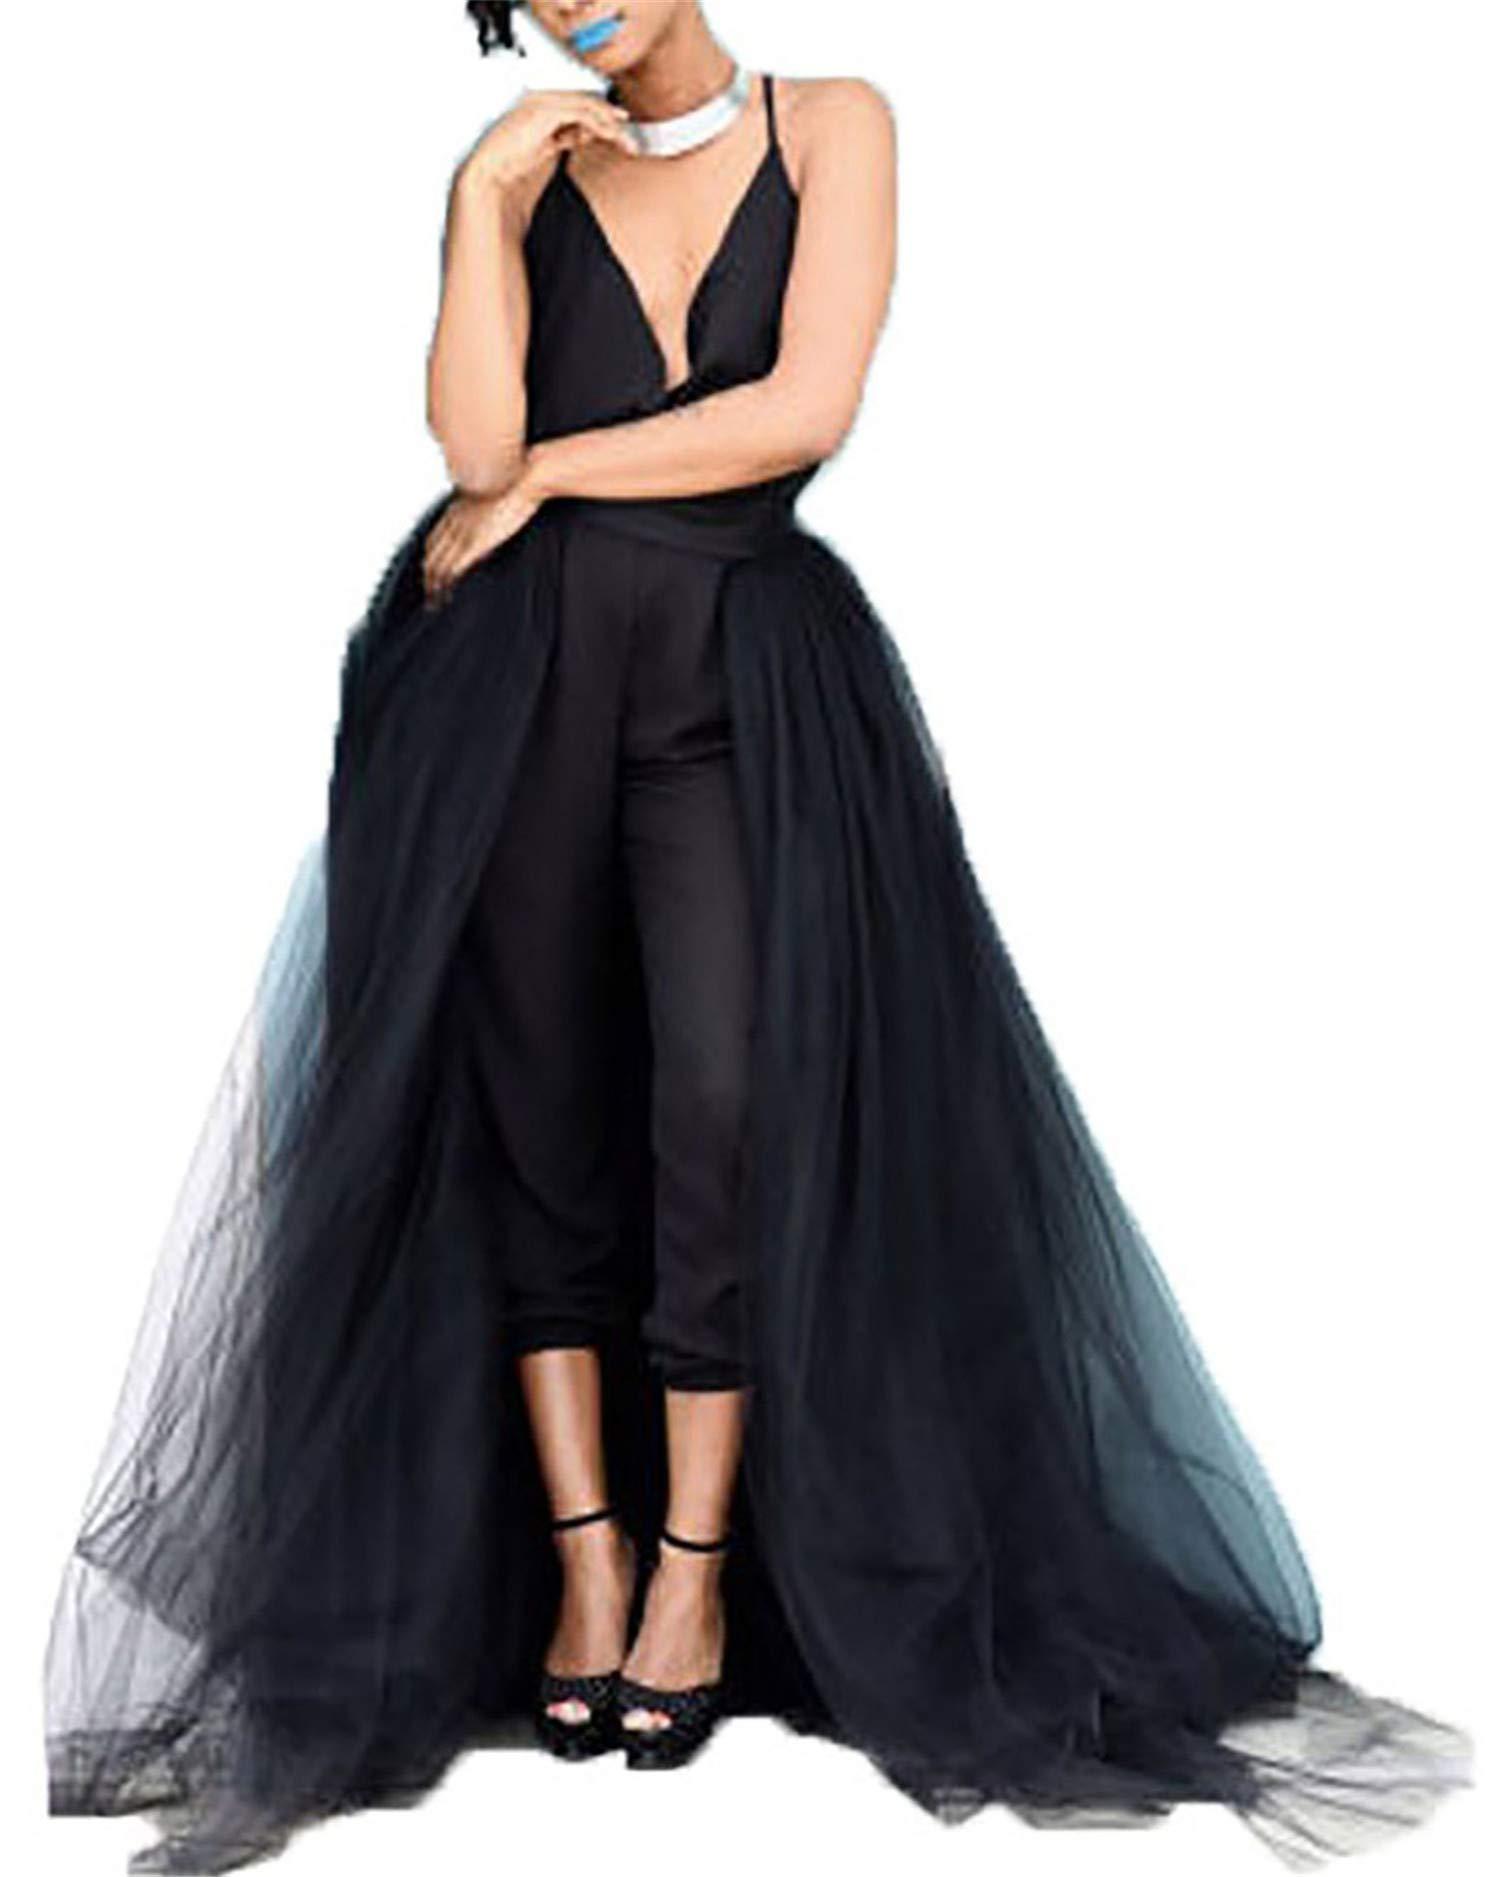 Women Wedding Maxi Tulle Skirts Detachable Train Overskirt Overlay Long Bridal Black by YULUOSHA